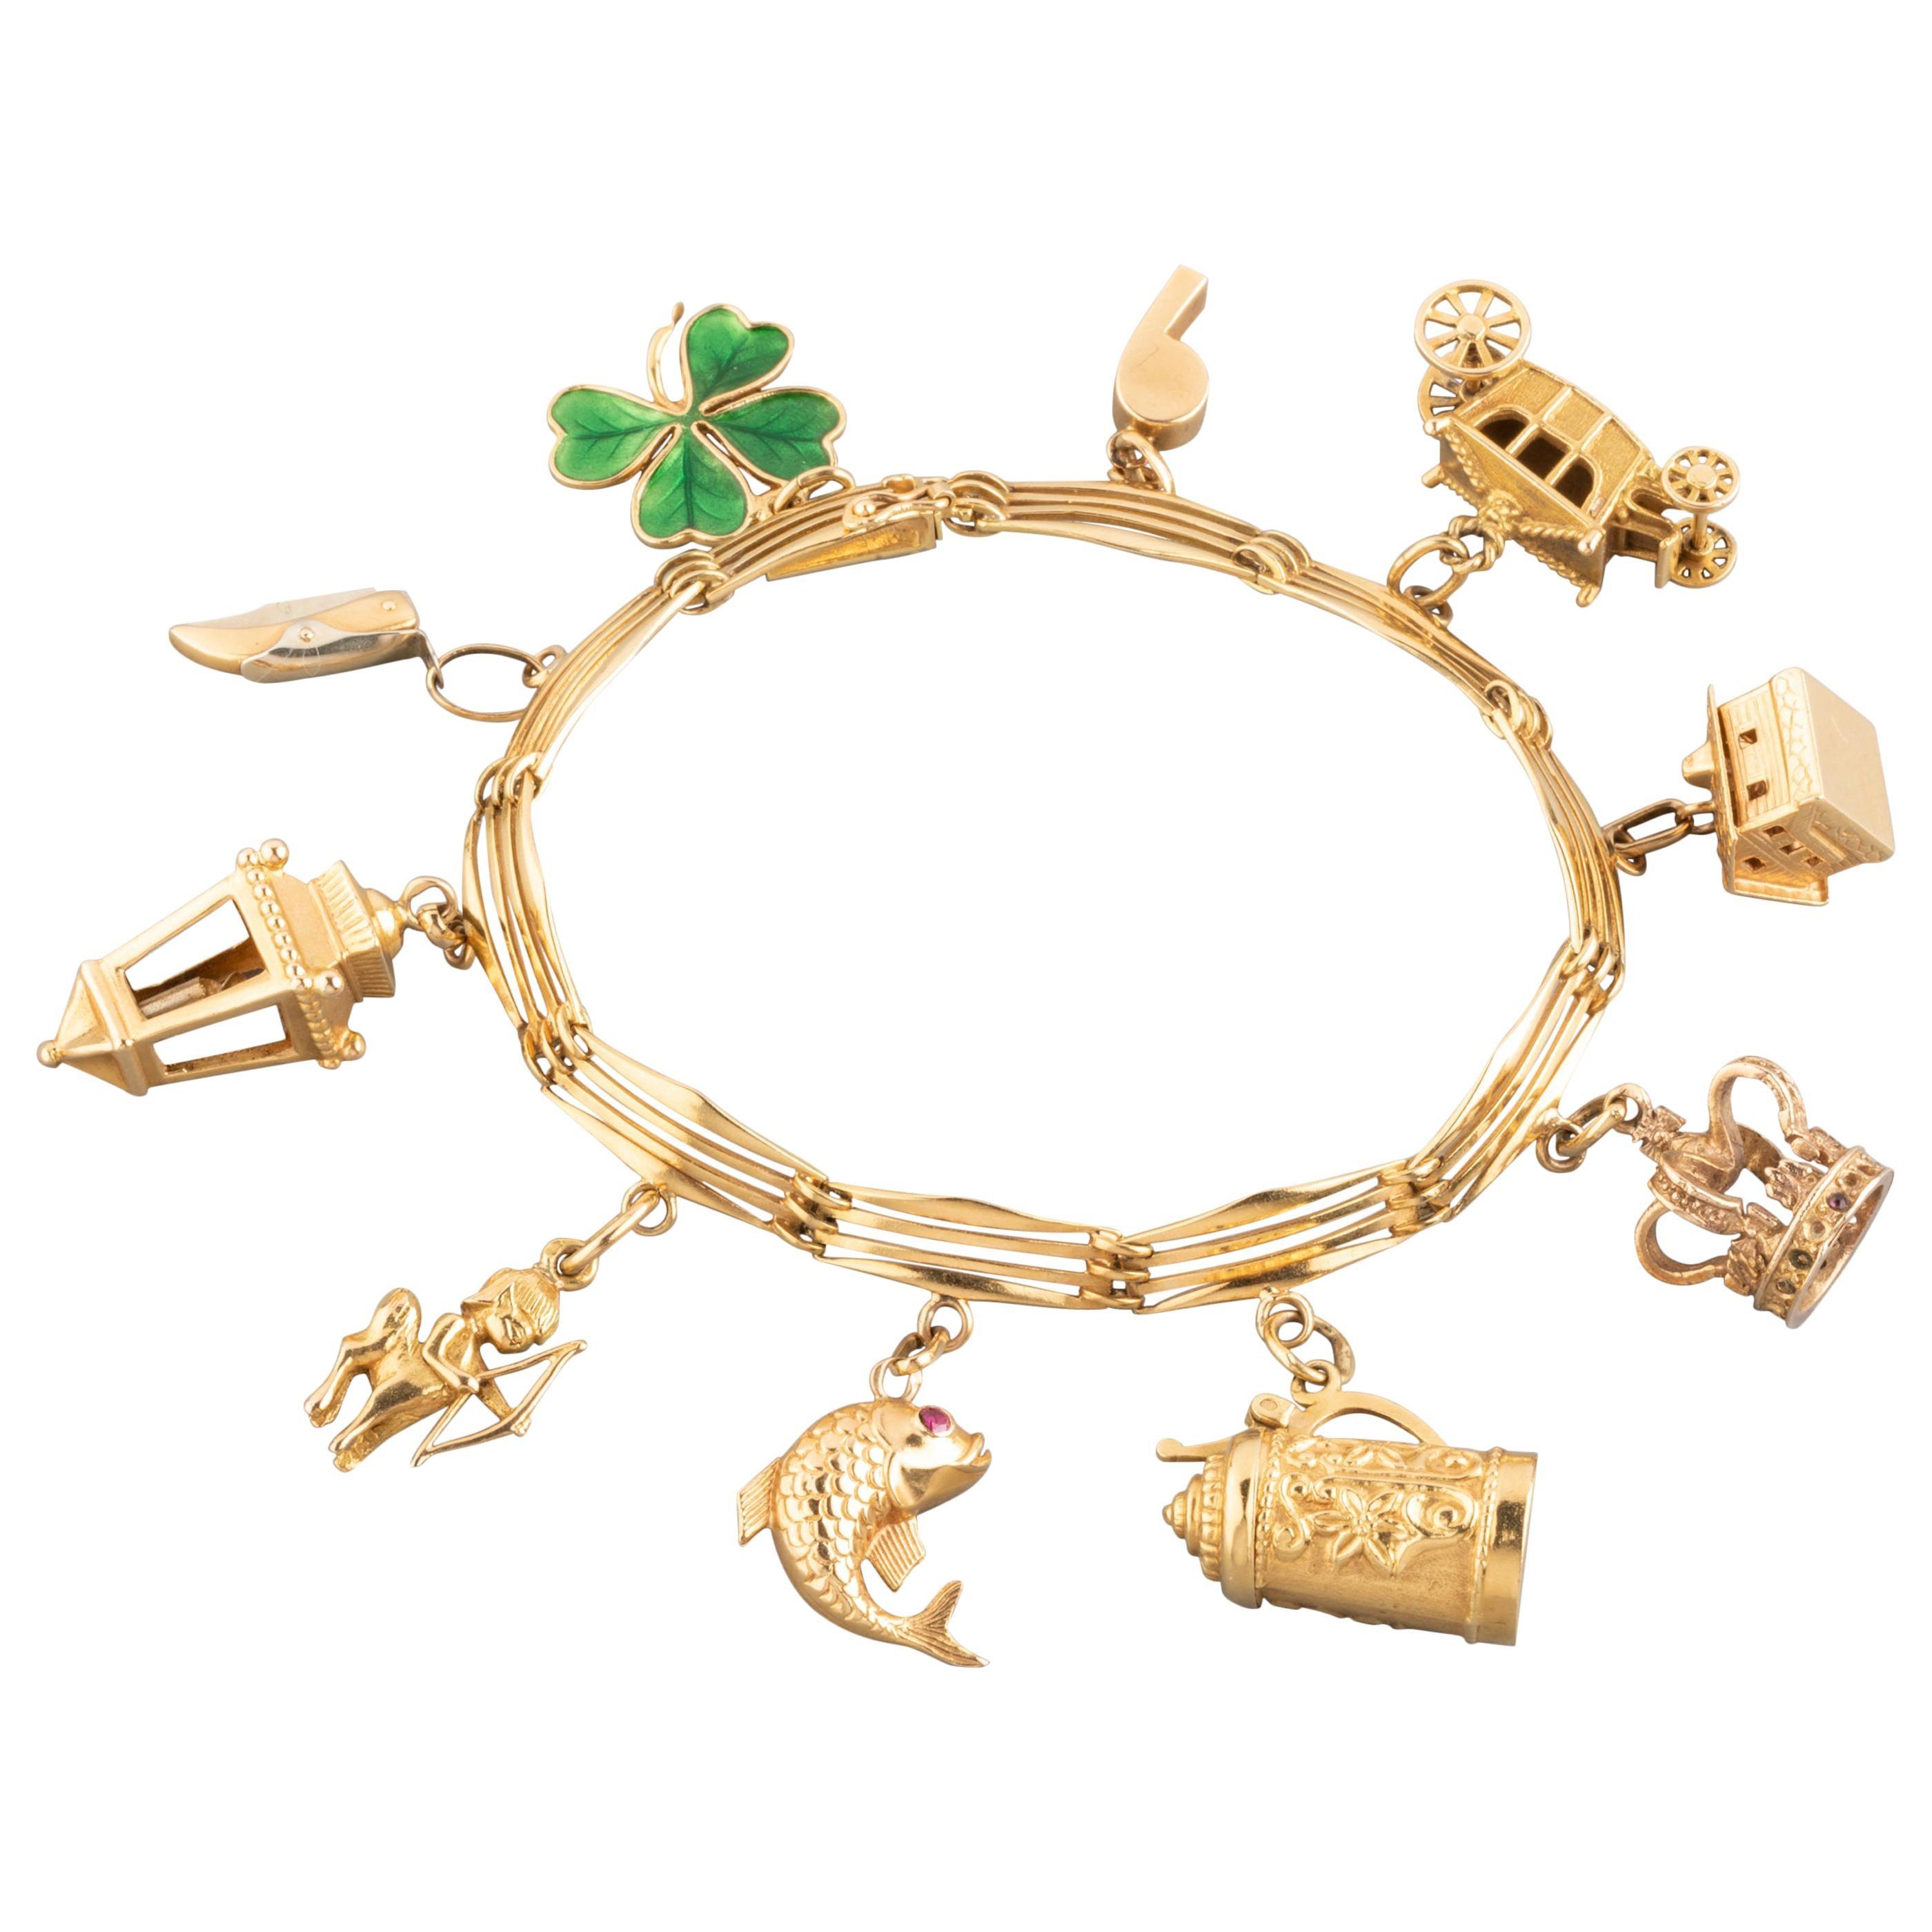 French Gold Vintage Charms Bracelet